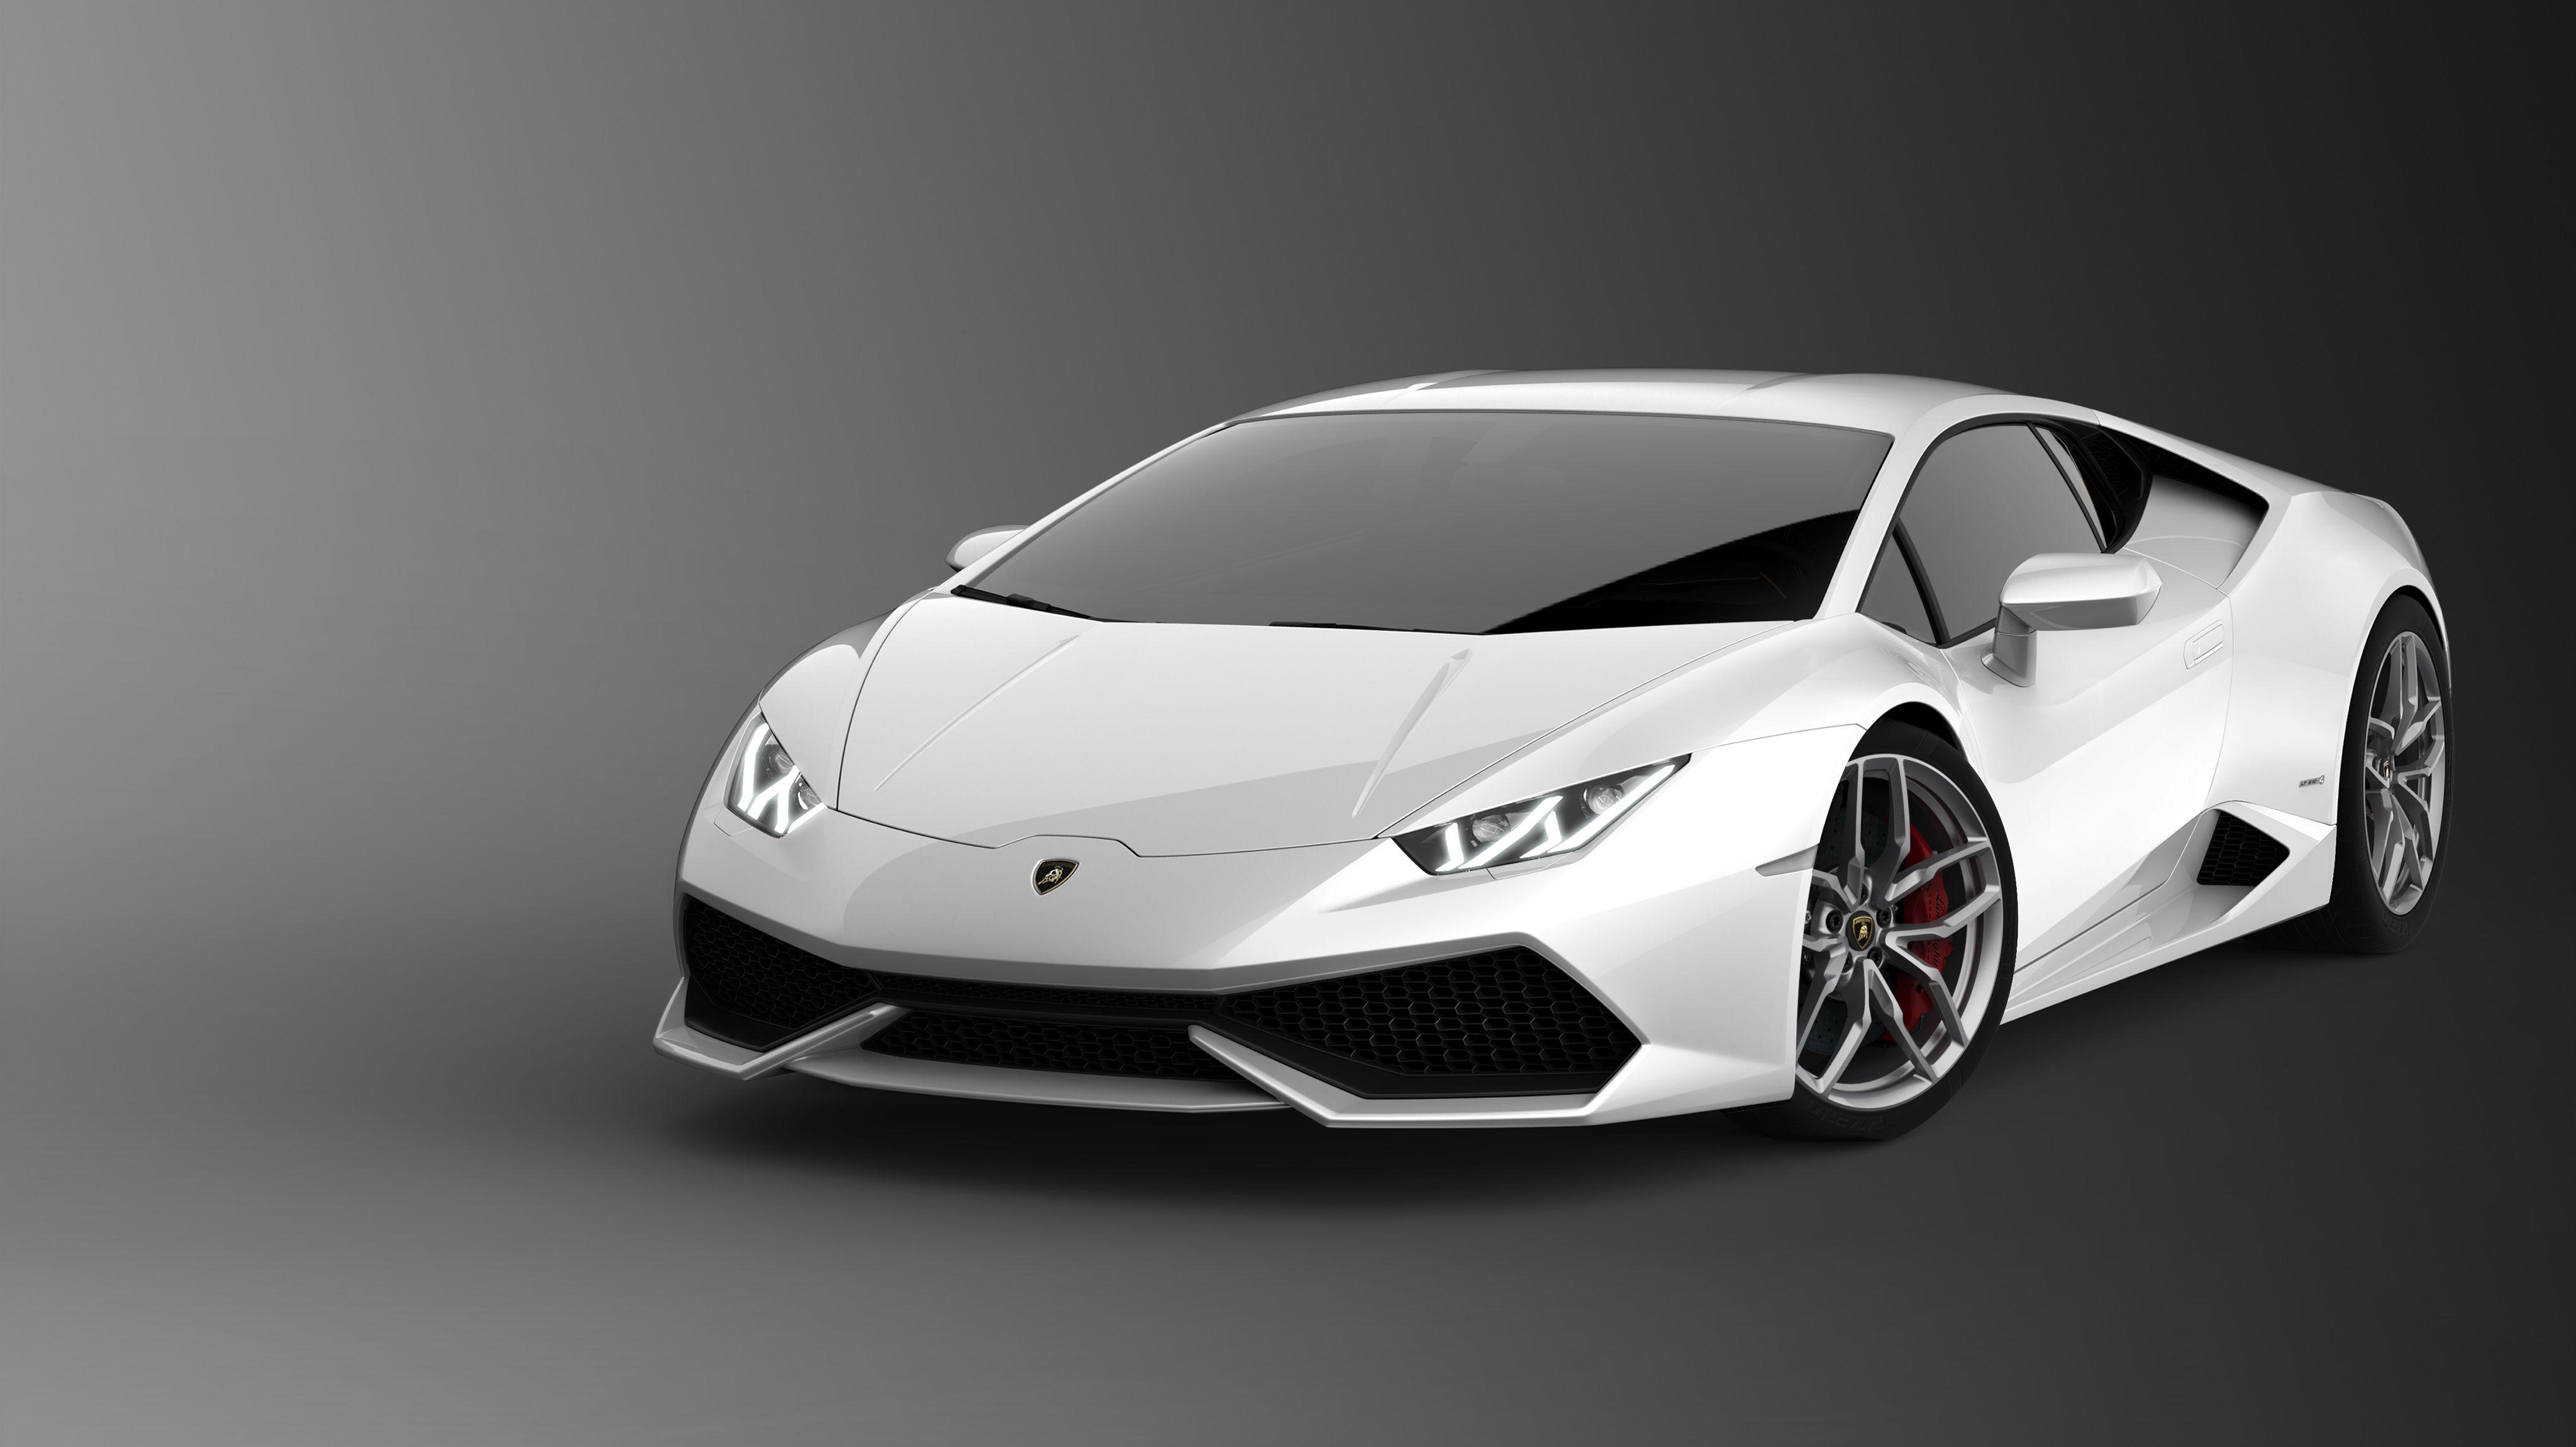 e2342e8a8512d3b7bda9a2c46c66a7b8 Marvelous Lamborghini Huracan Price In Uae Cars Trend